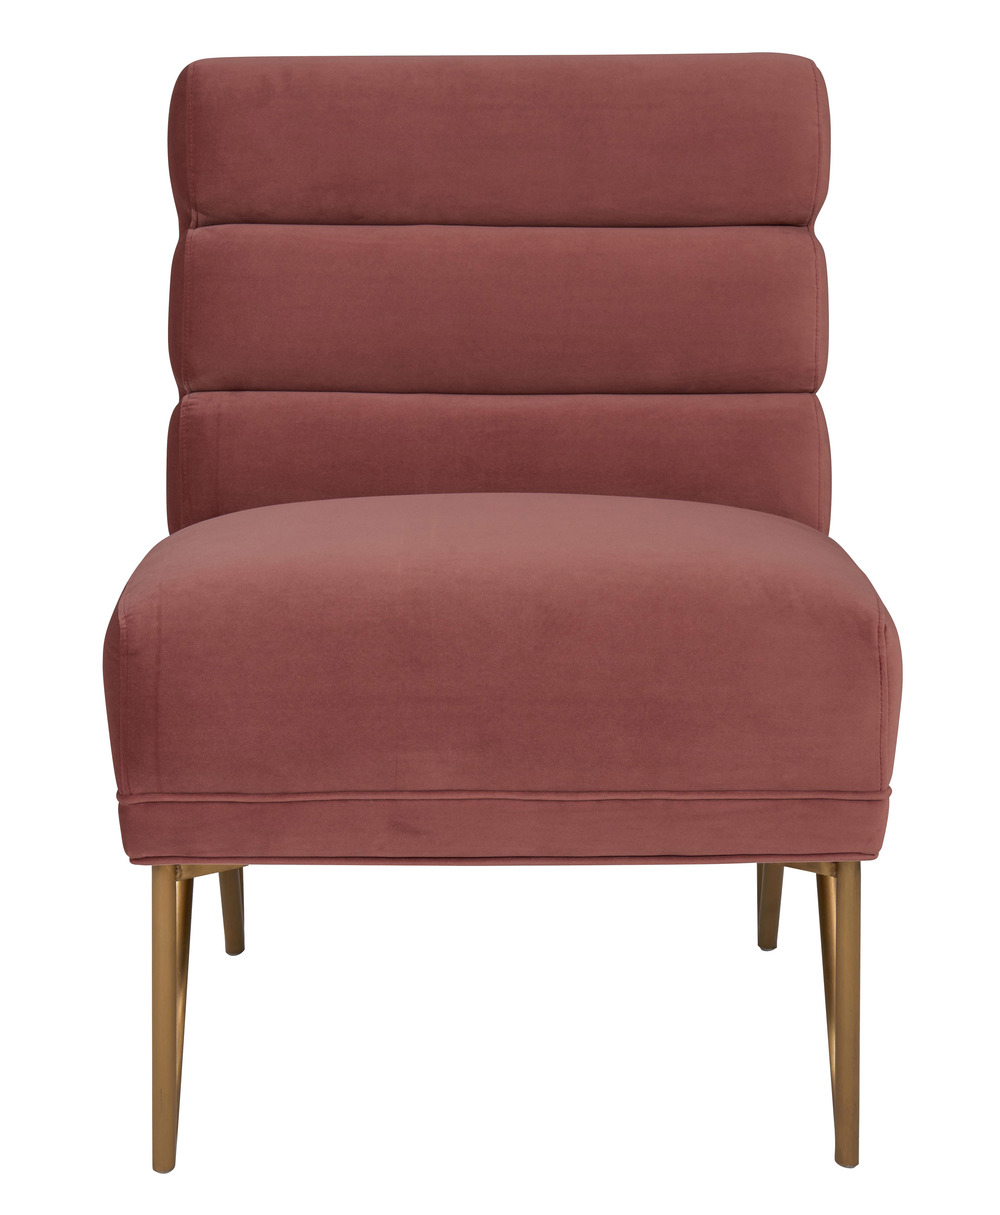 TOV Furniture - Kelly Slub Salmon Velvet Chair